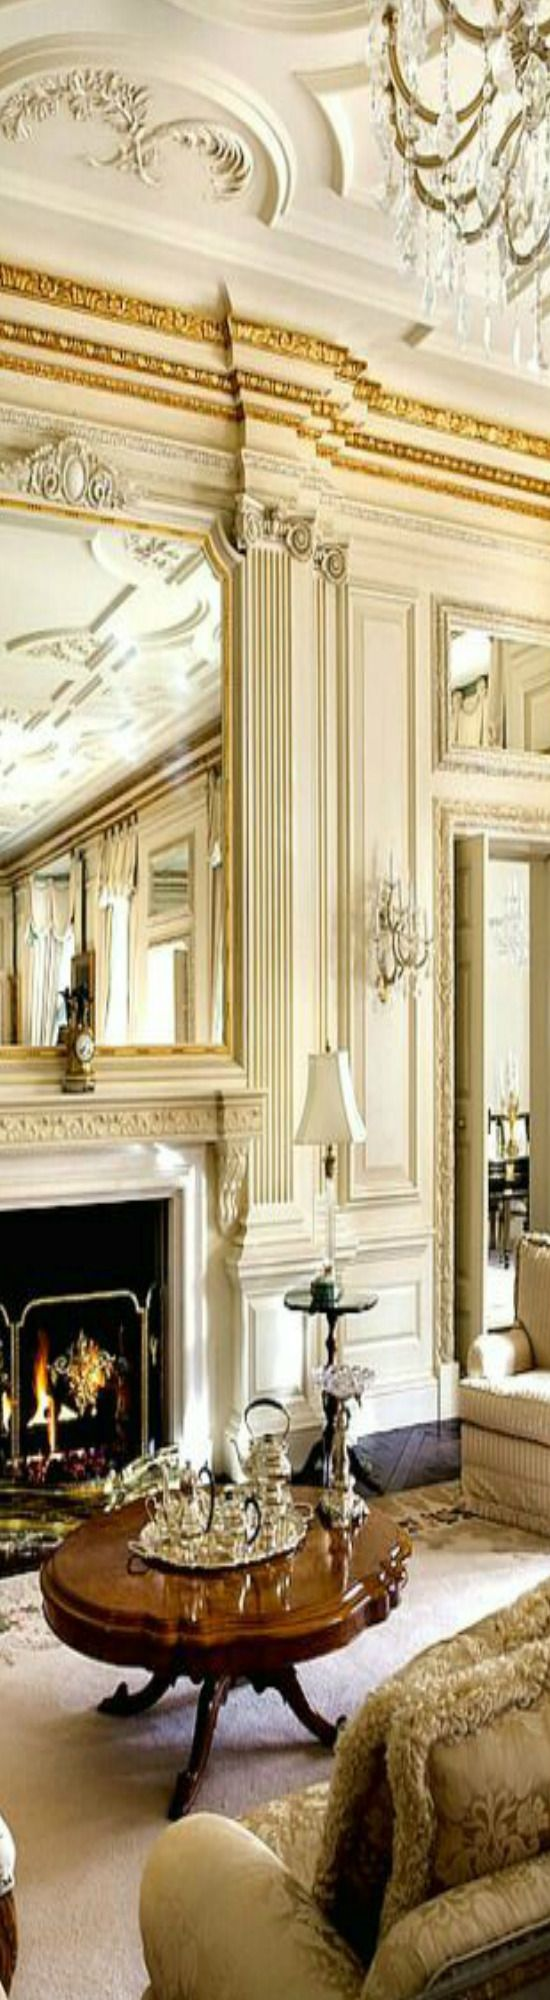 9362 best ****DREAM HOMES images on Pinterest   Luxury houses ...